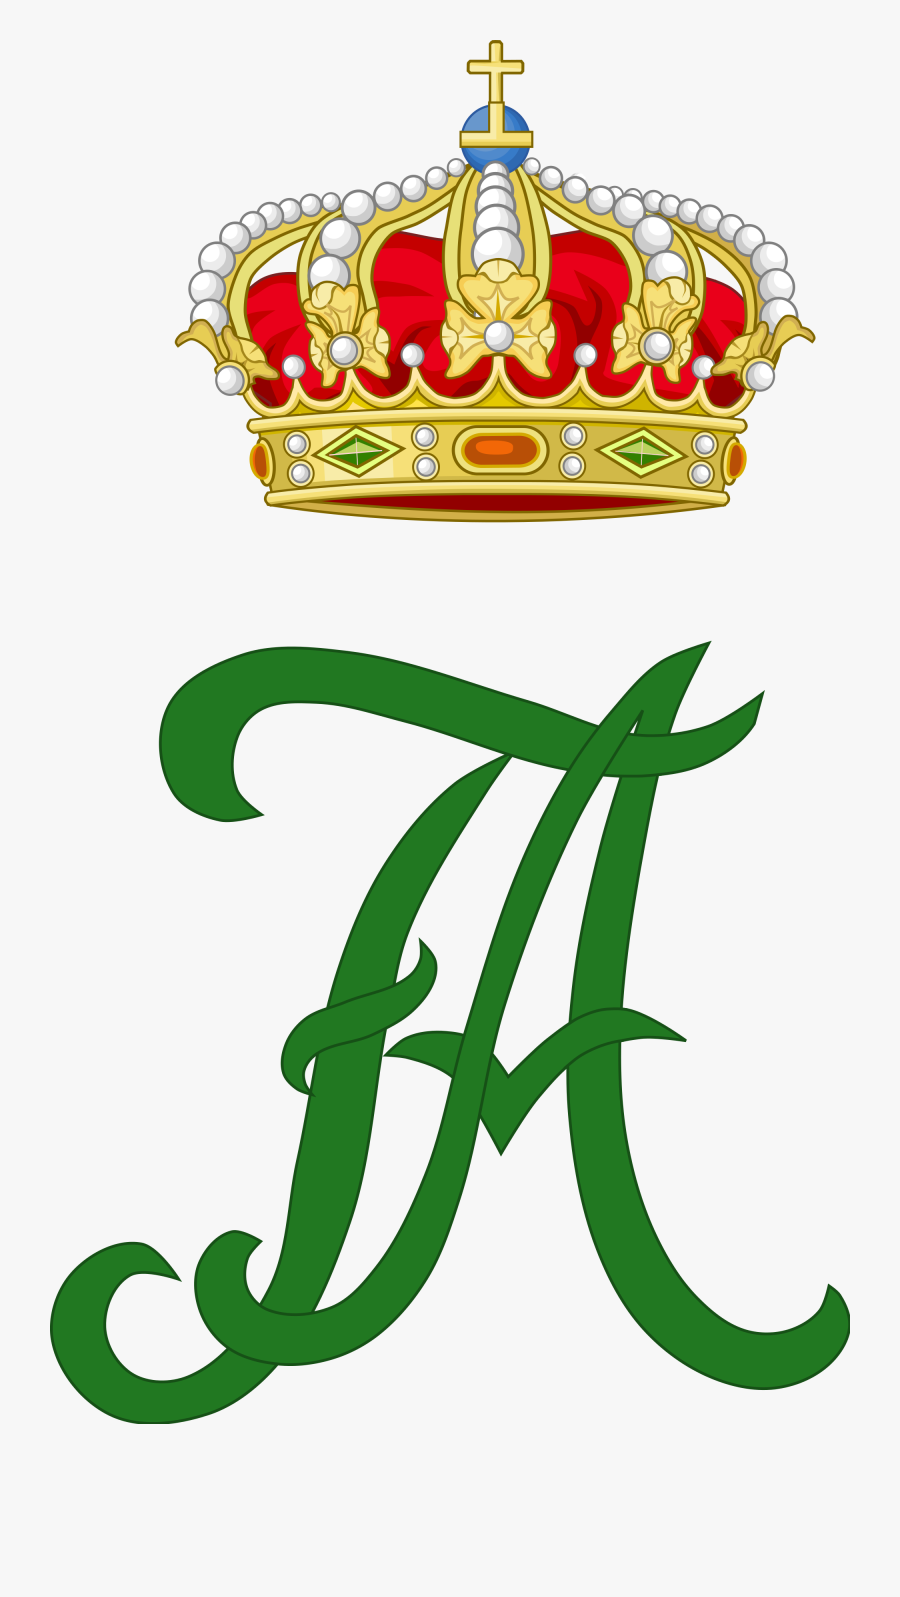 Royal Monogram Of King Frederick Augustus Iii Of Saxony - King George Ii Symbol, Transparent Clipart